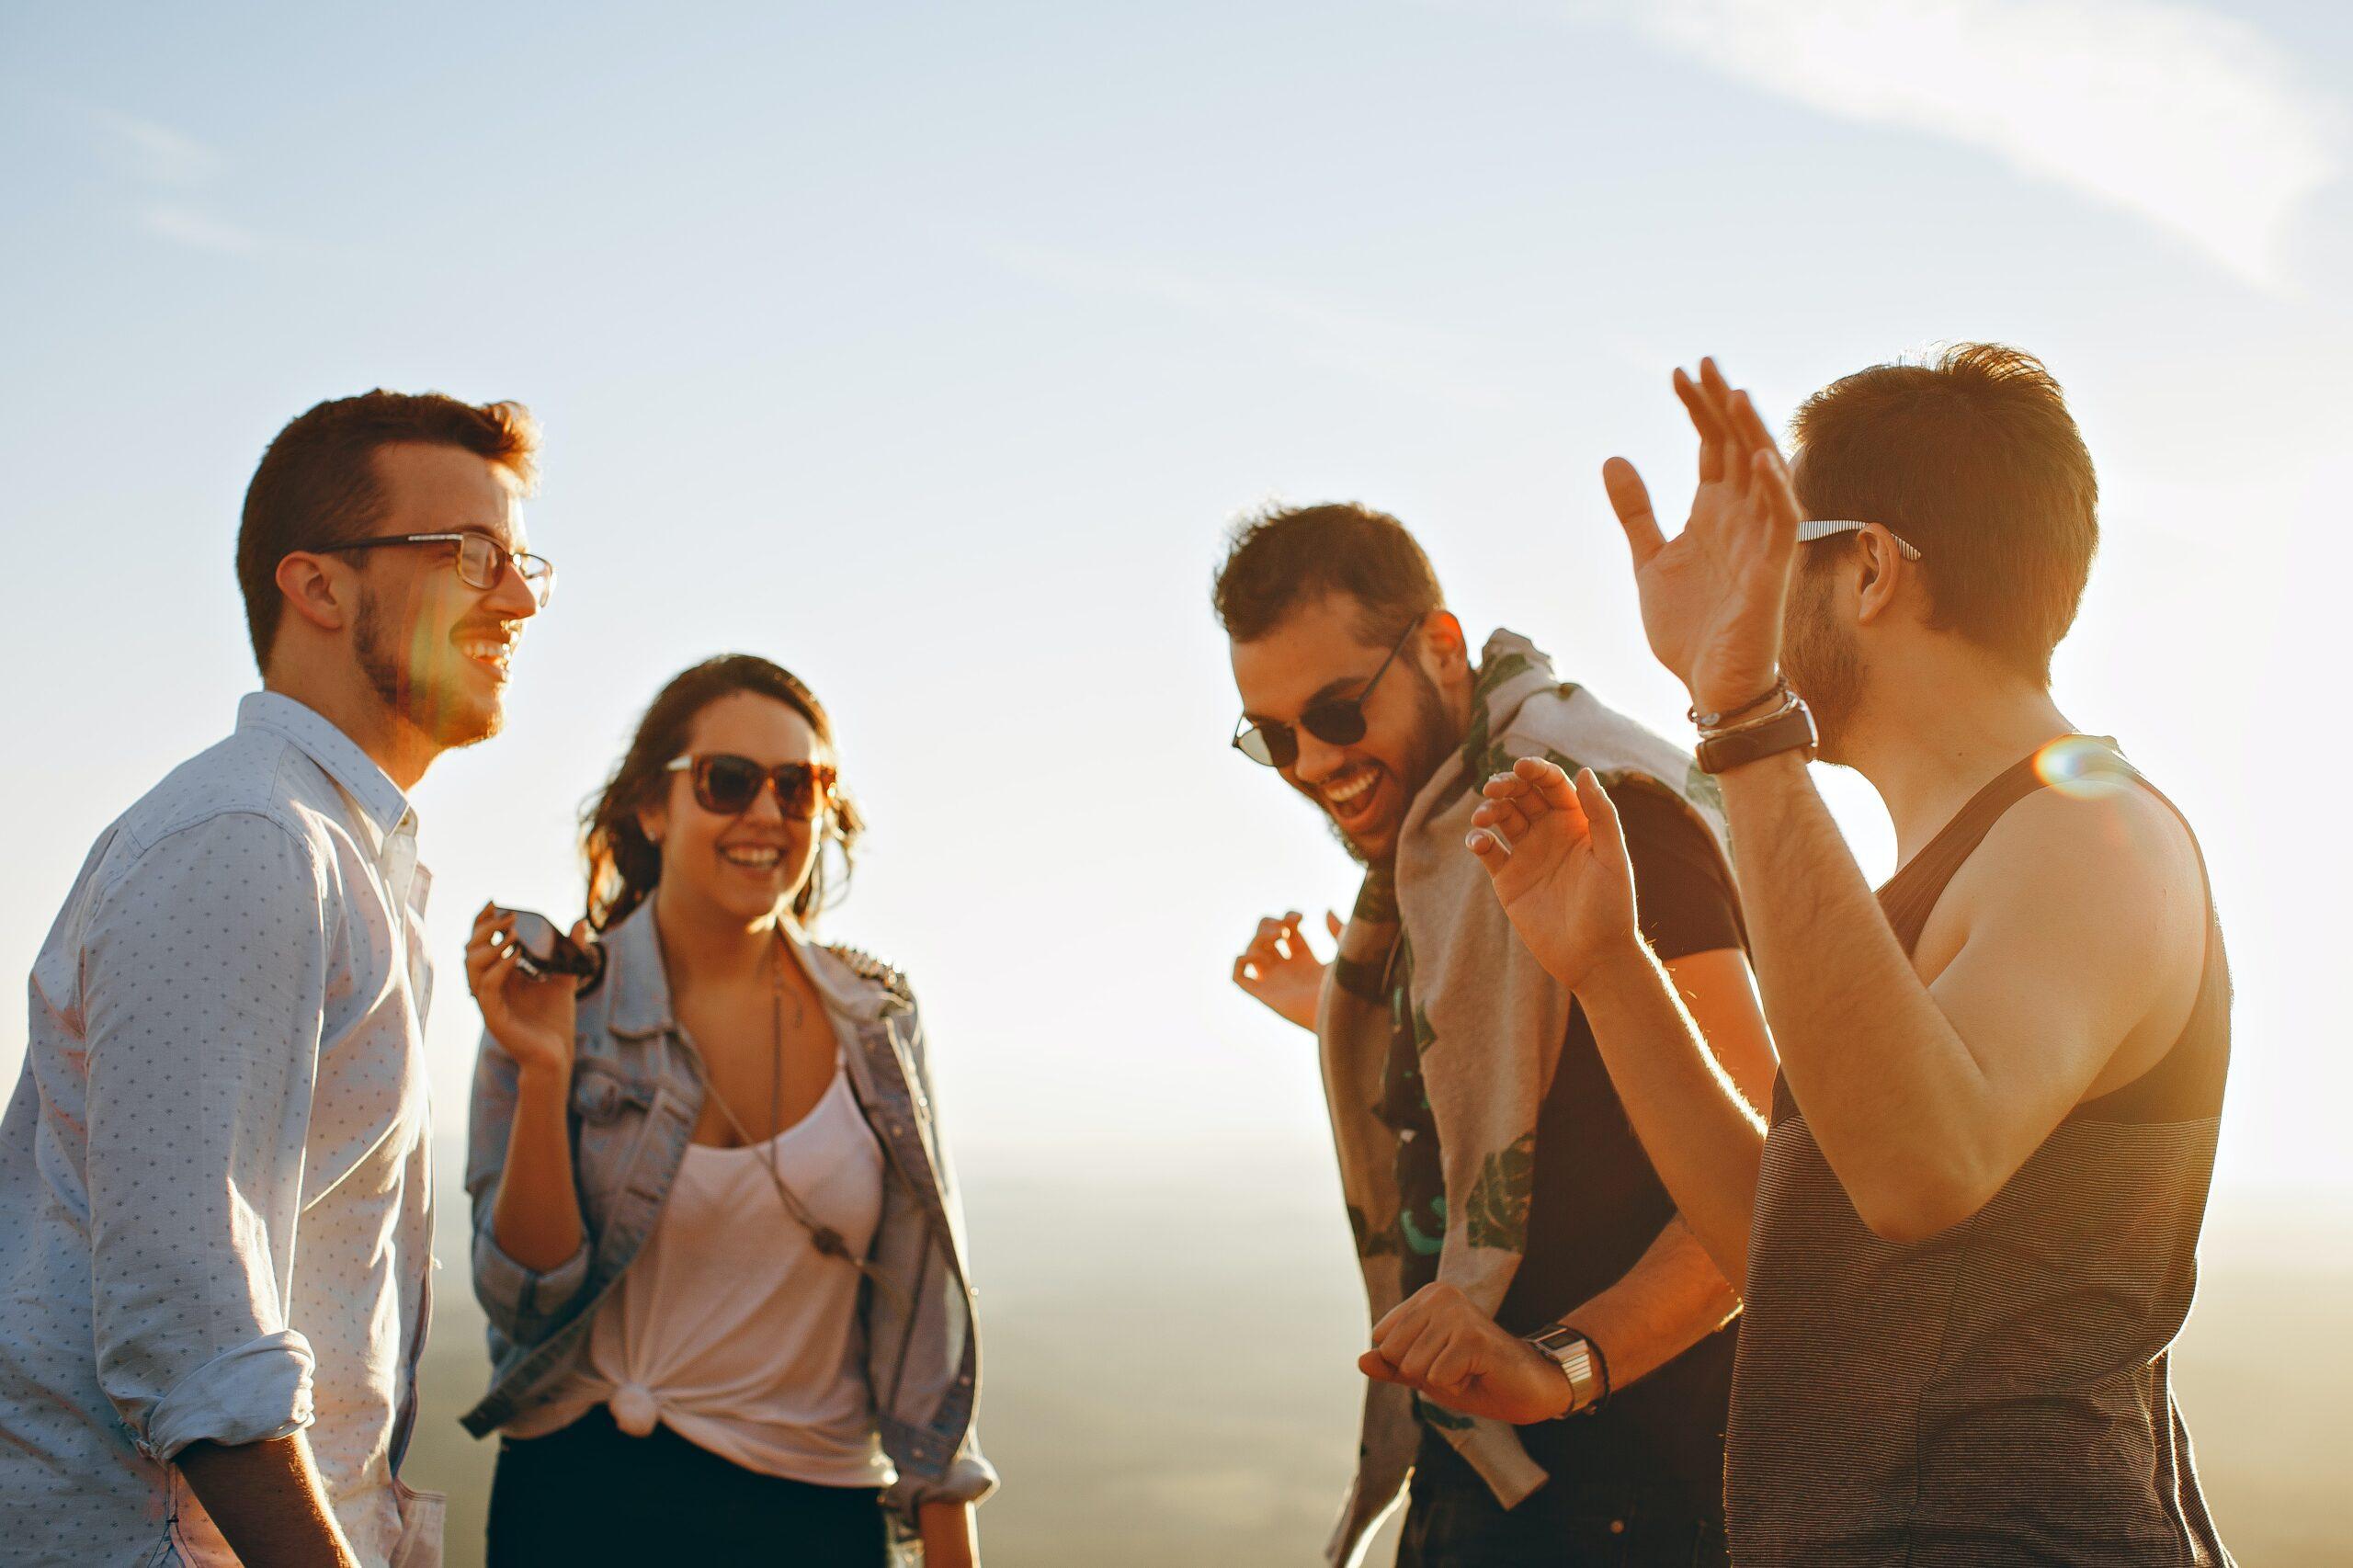 helena-lopes-Group of friends talking outside-unsplash